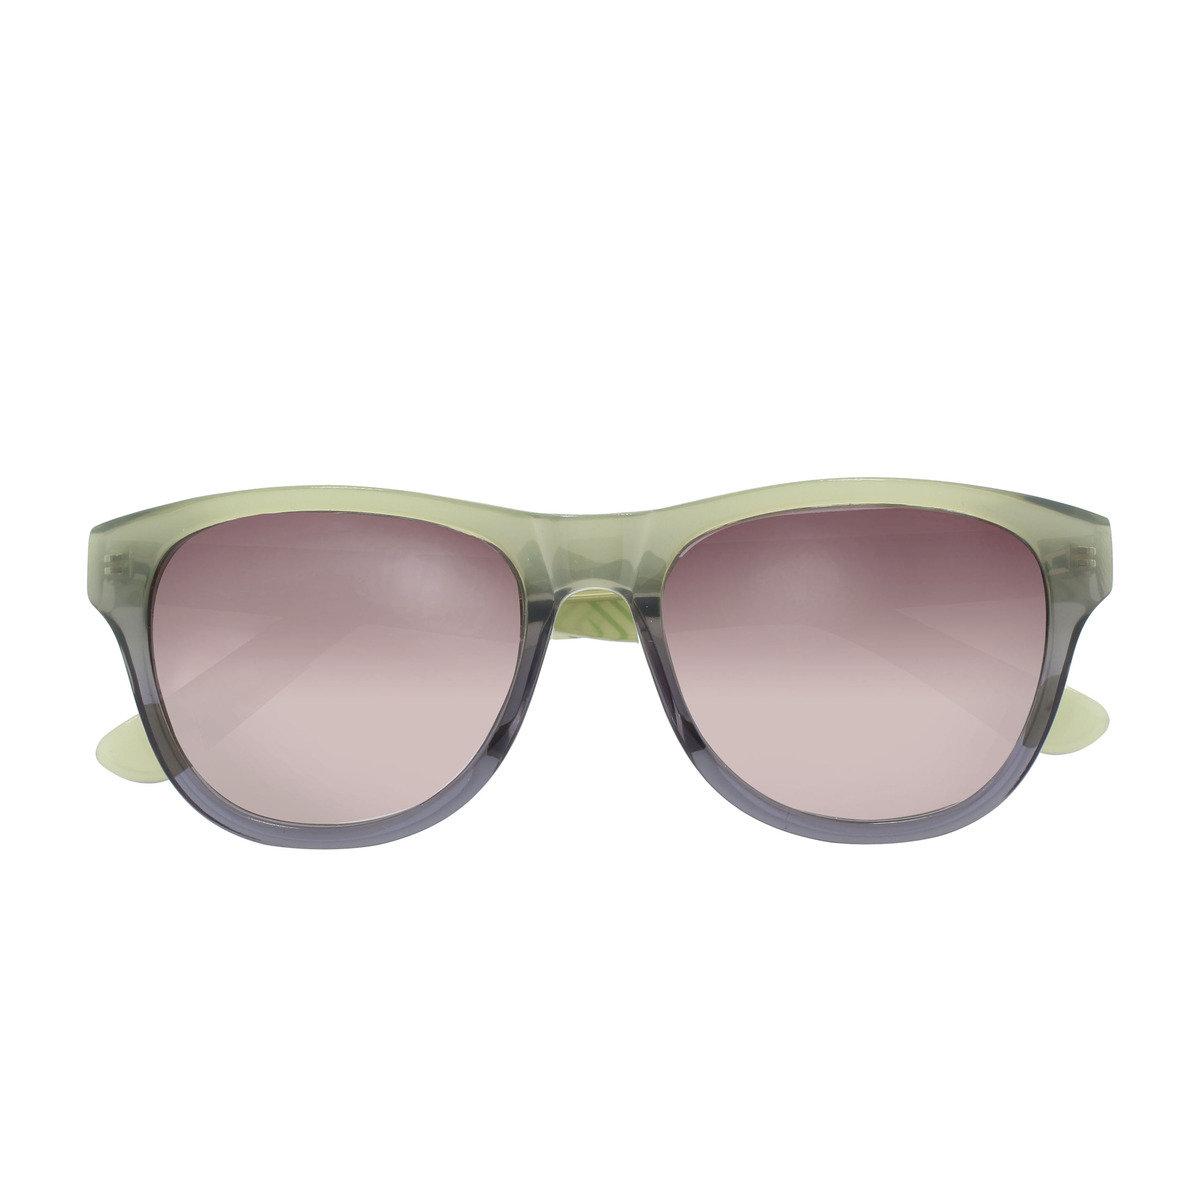 eGG時尚方框防UV淺綠太陽眼鏡